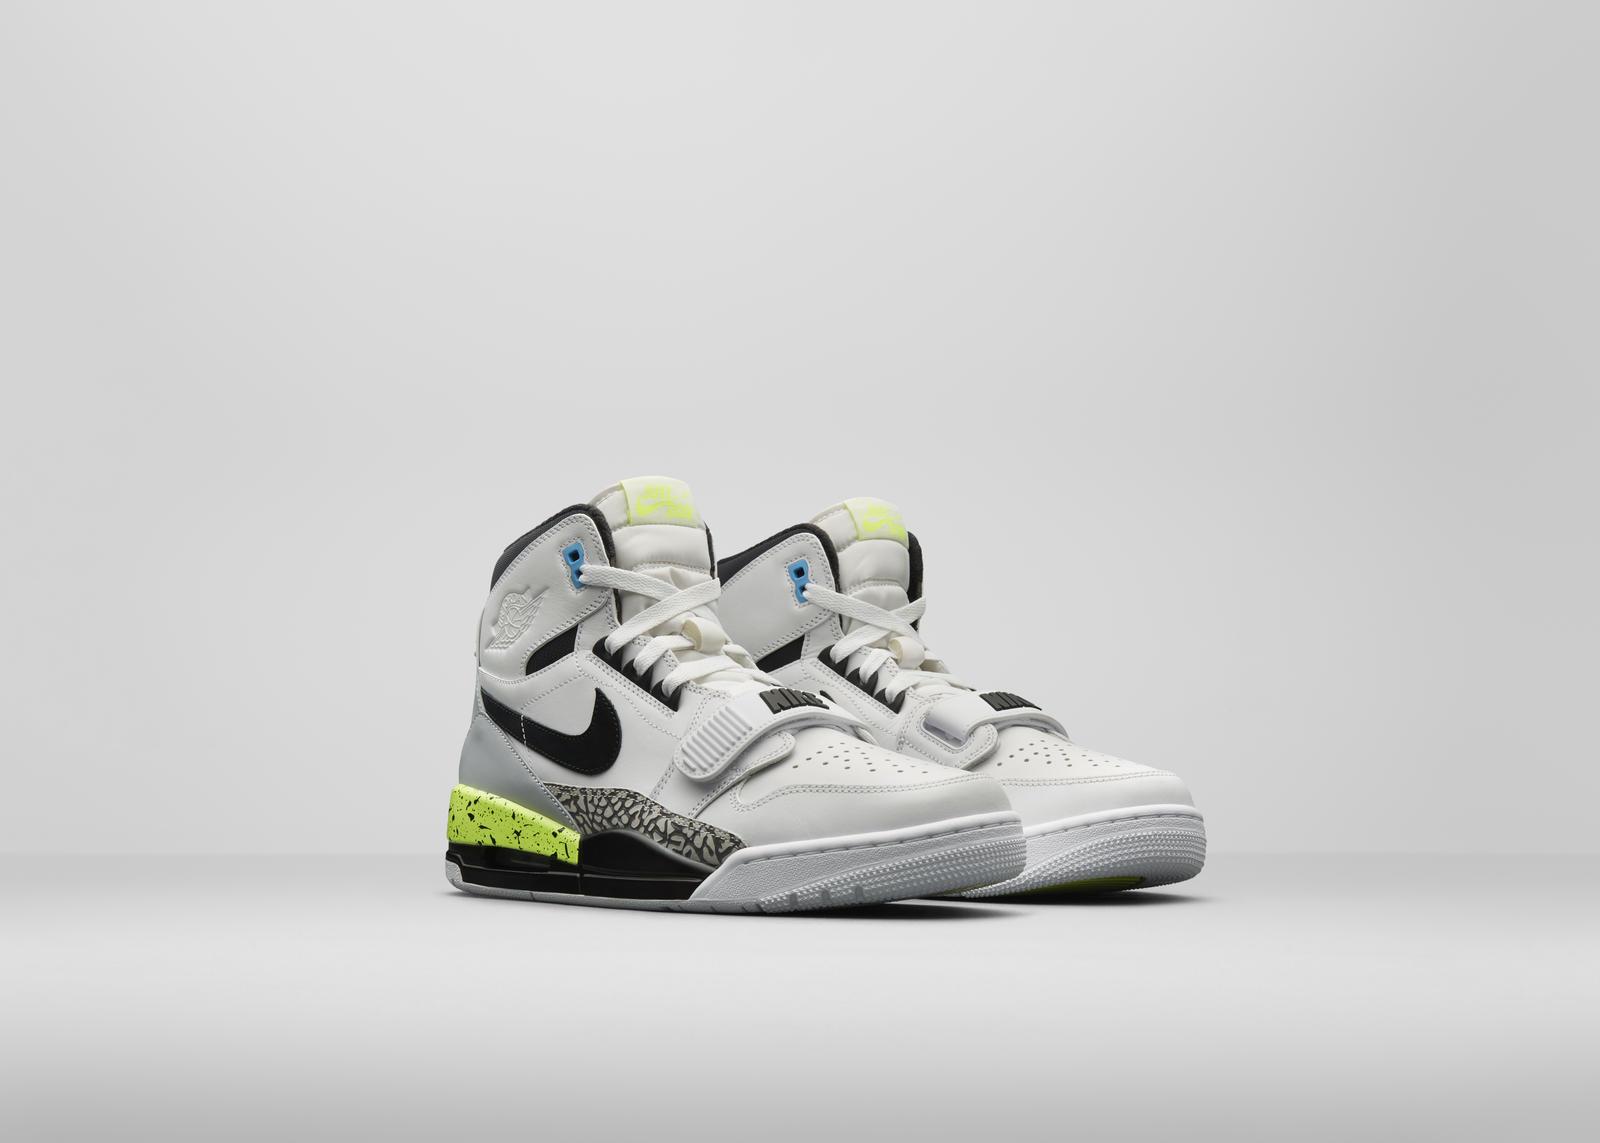 99290b12d64d94 Jordan Brand Fall 2018 Preview - Nike News